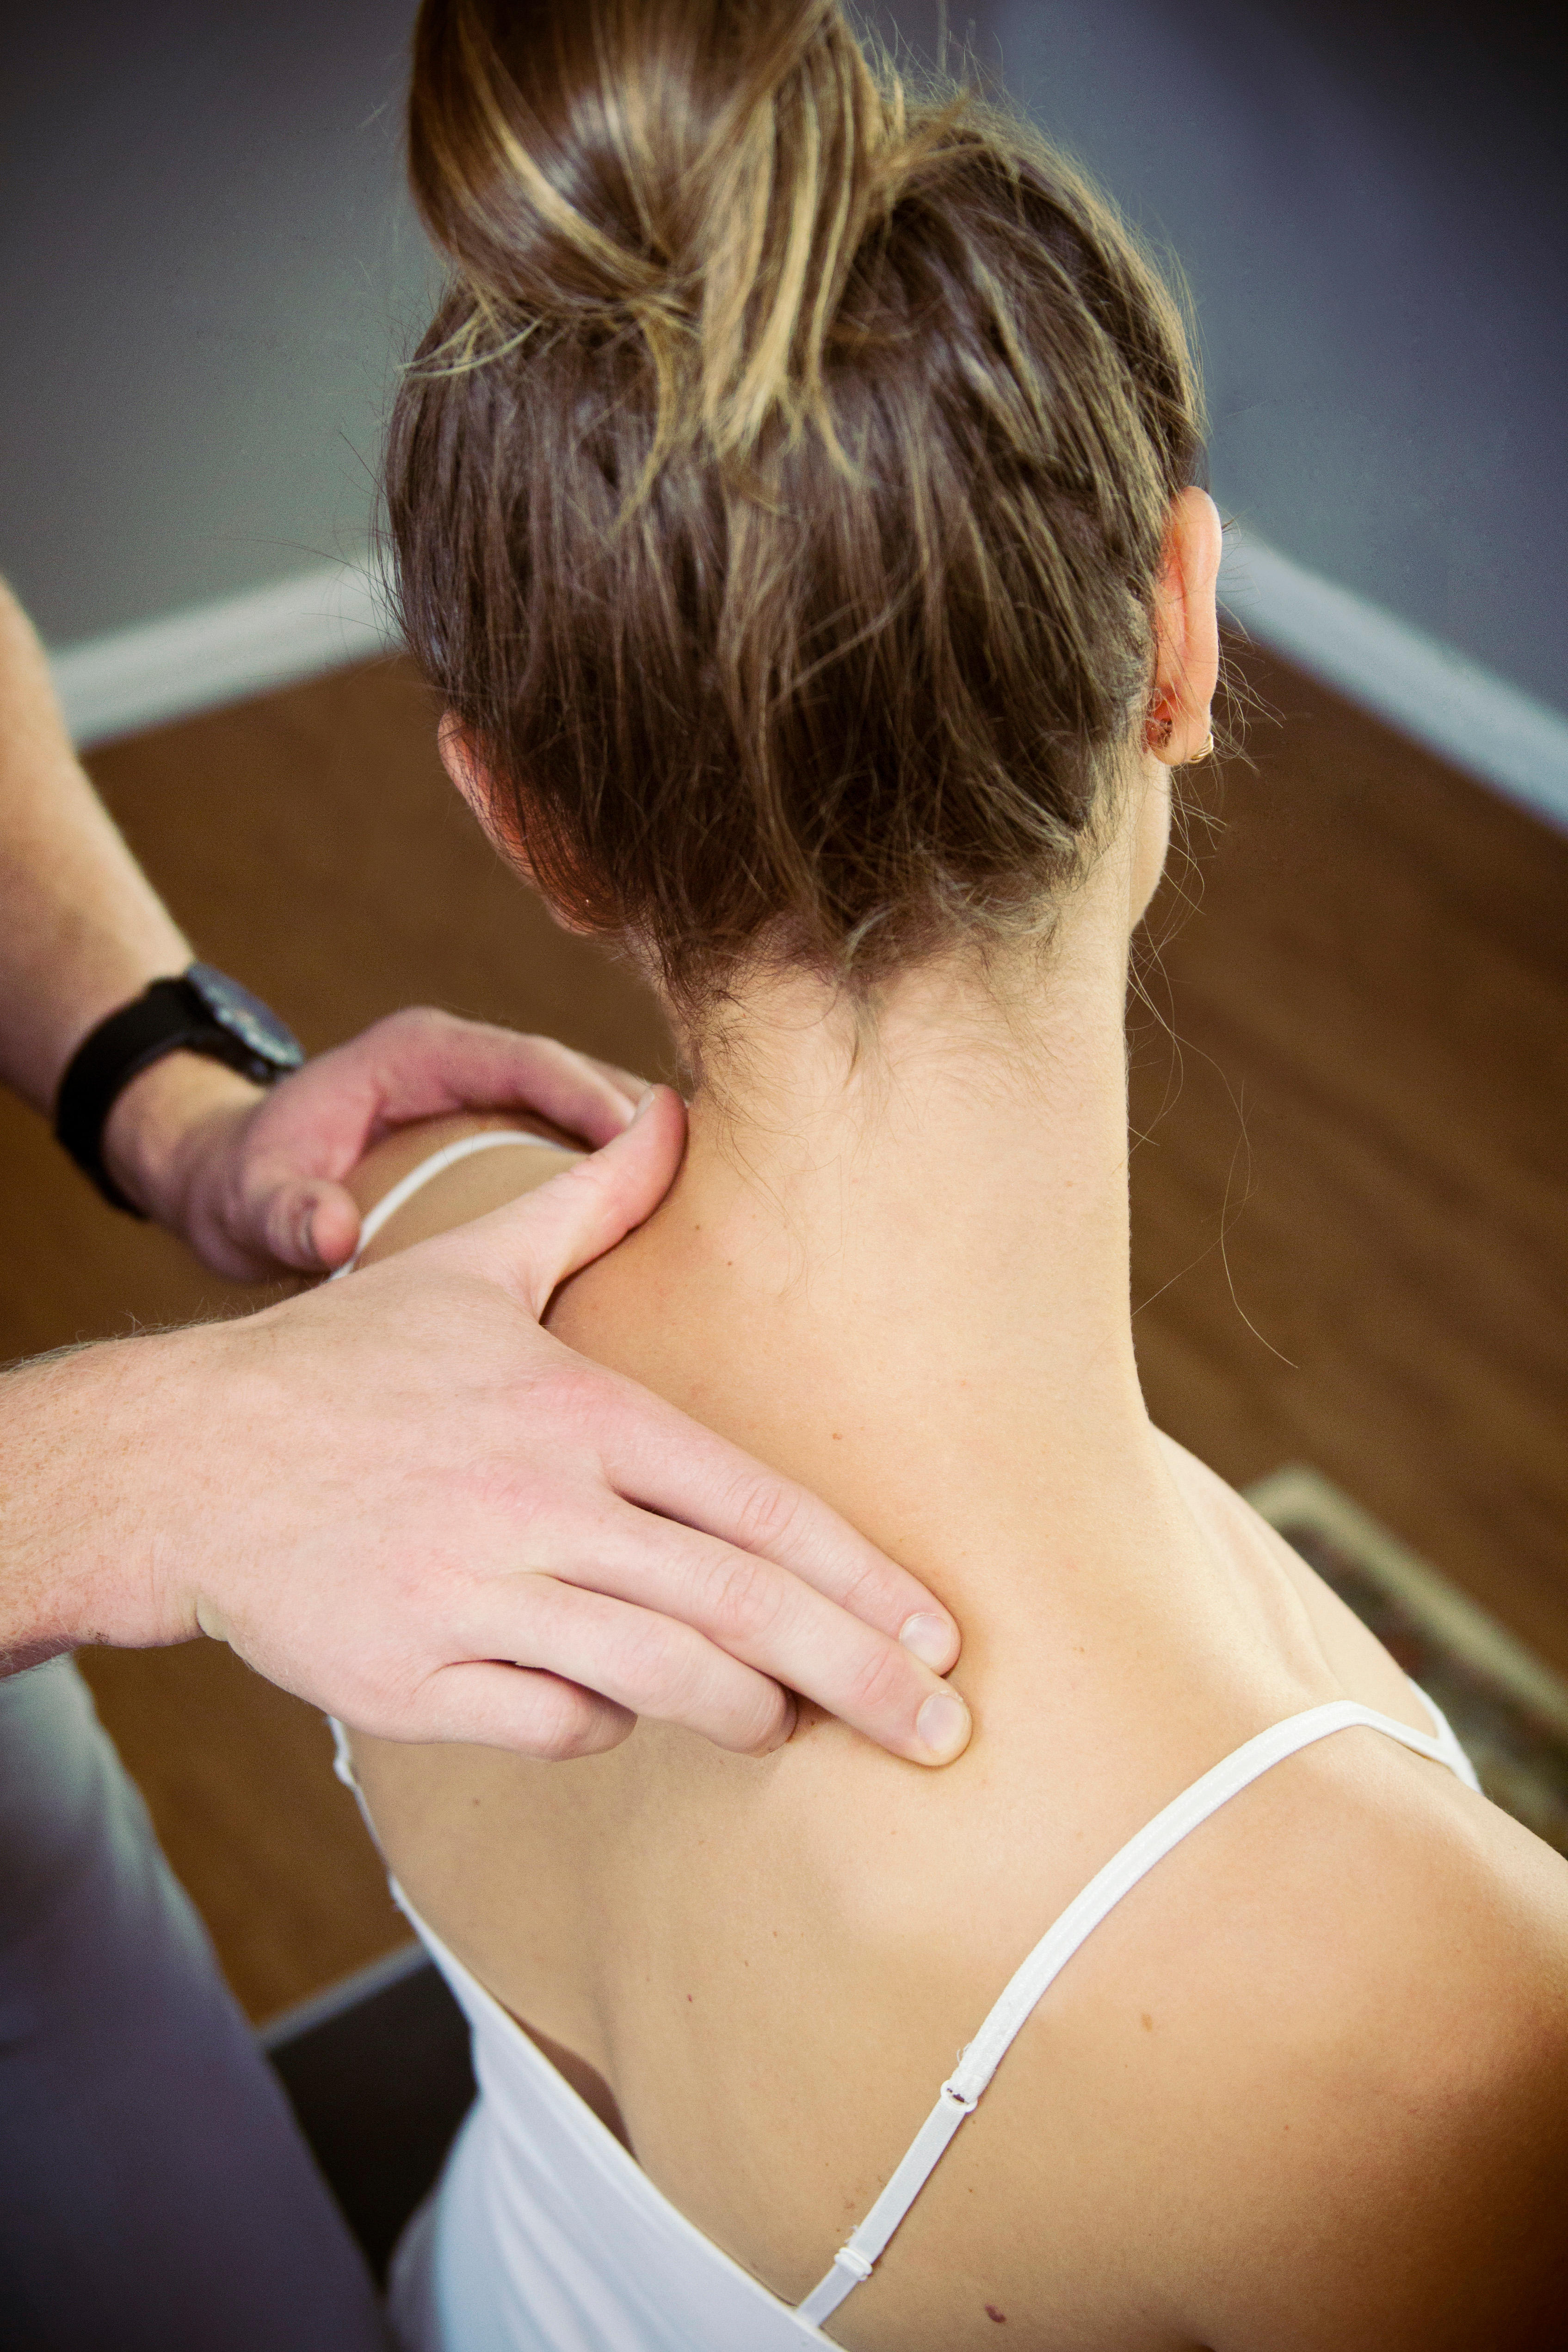 Merryman Chiropractic image 1